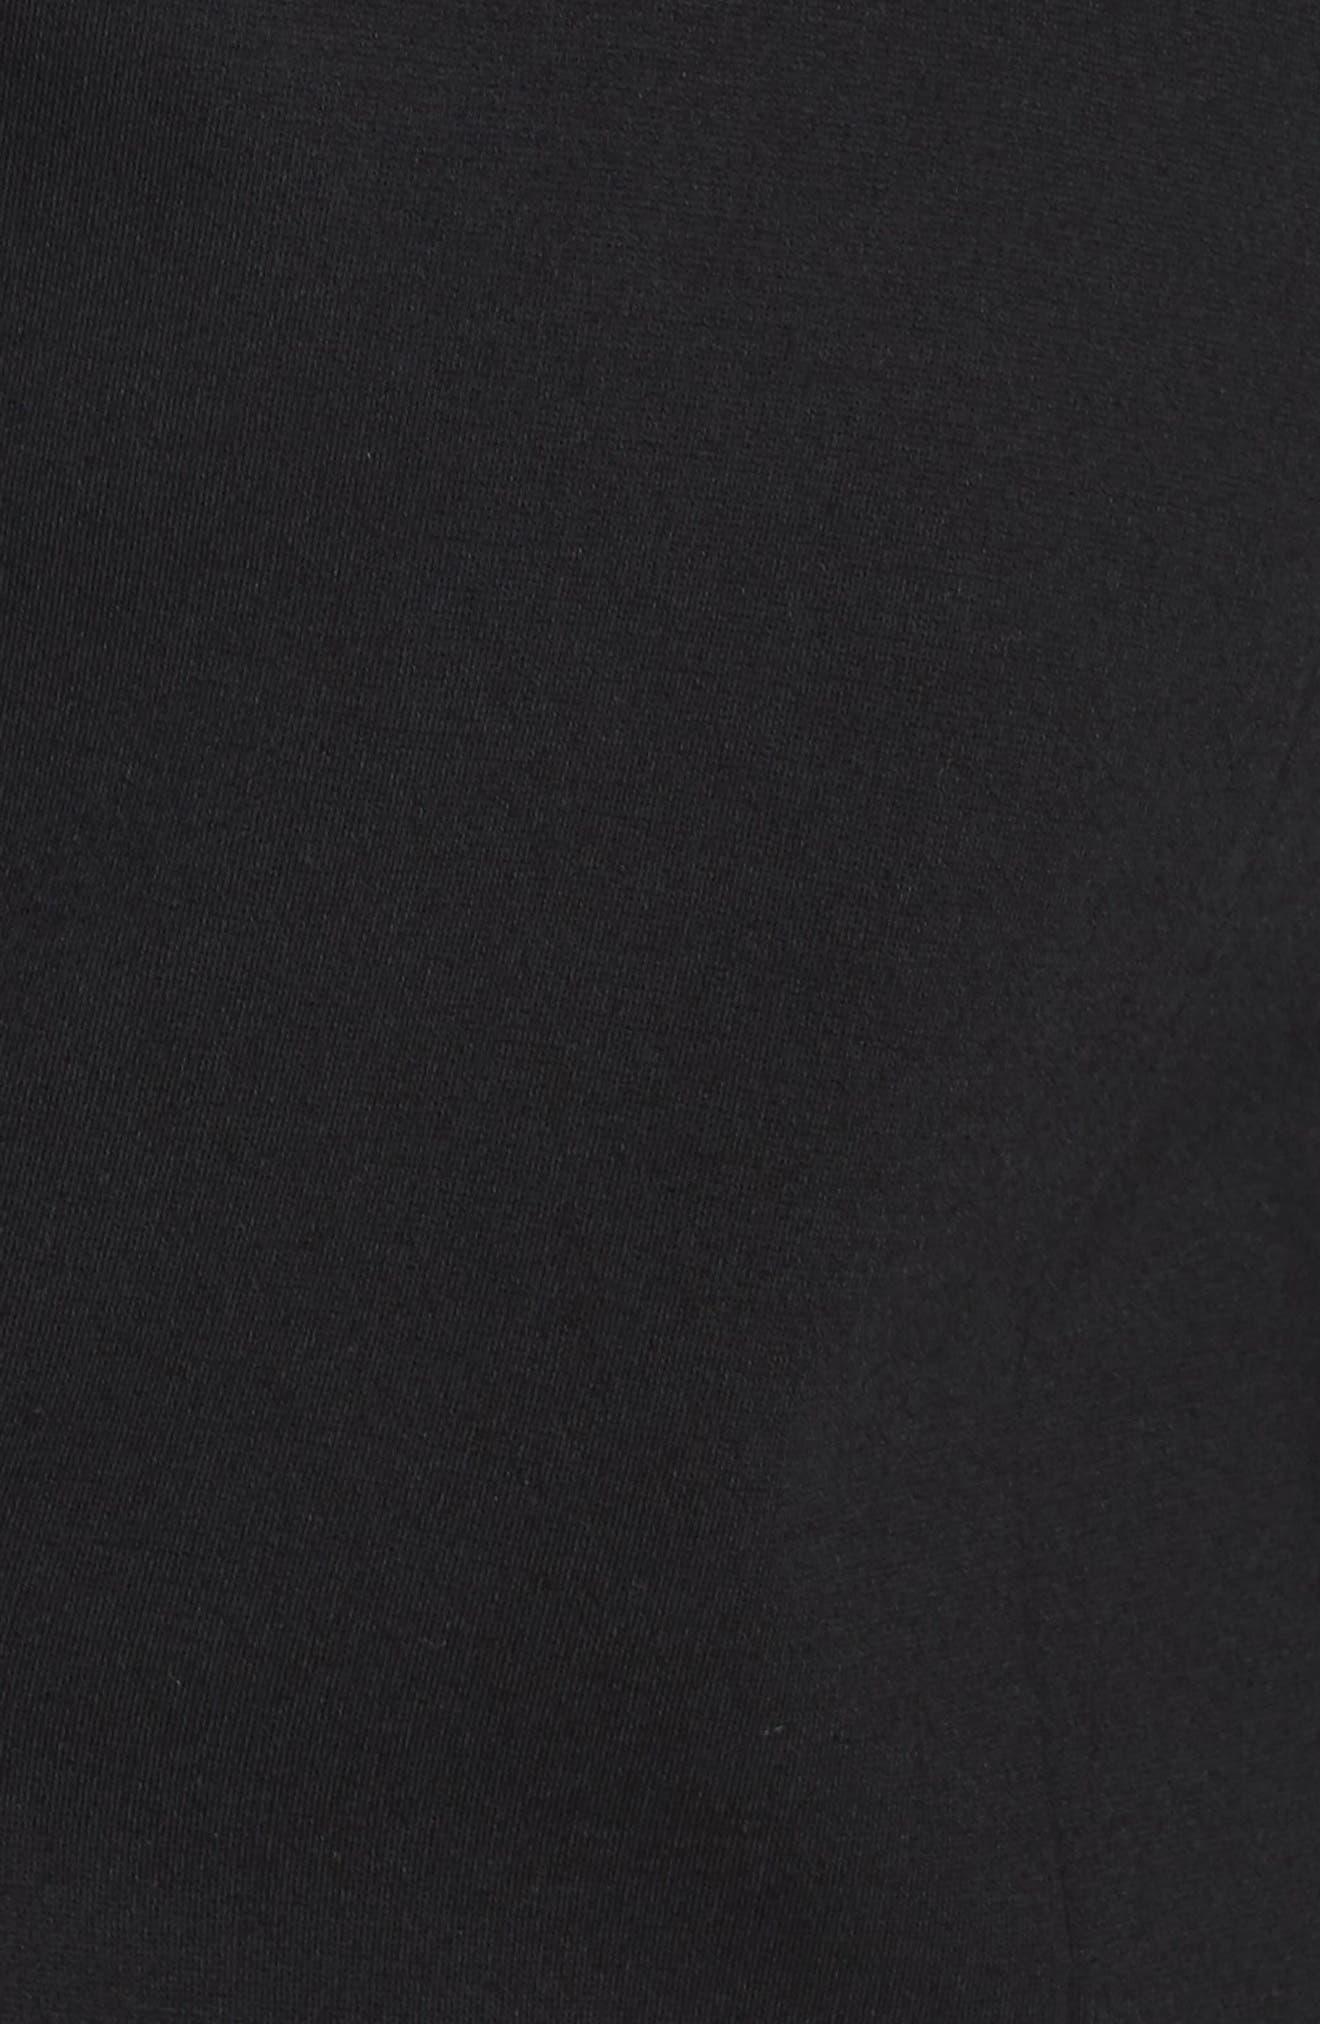 Ruched Sleeve Ponte Blazer,                             Alternate thumbnail 7, color,                             RICH BLACK